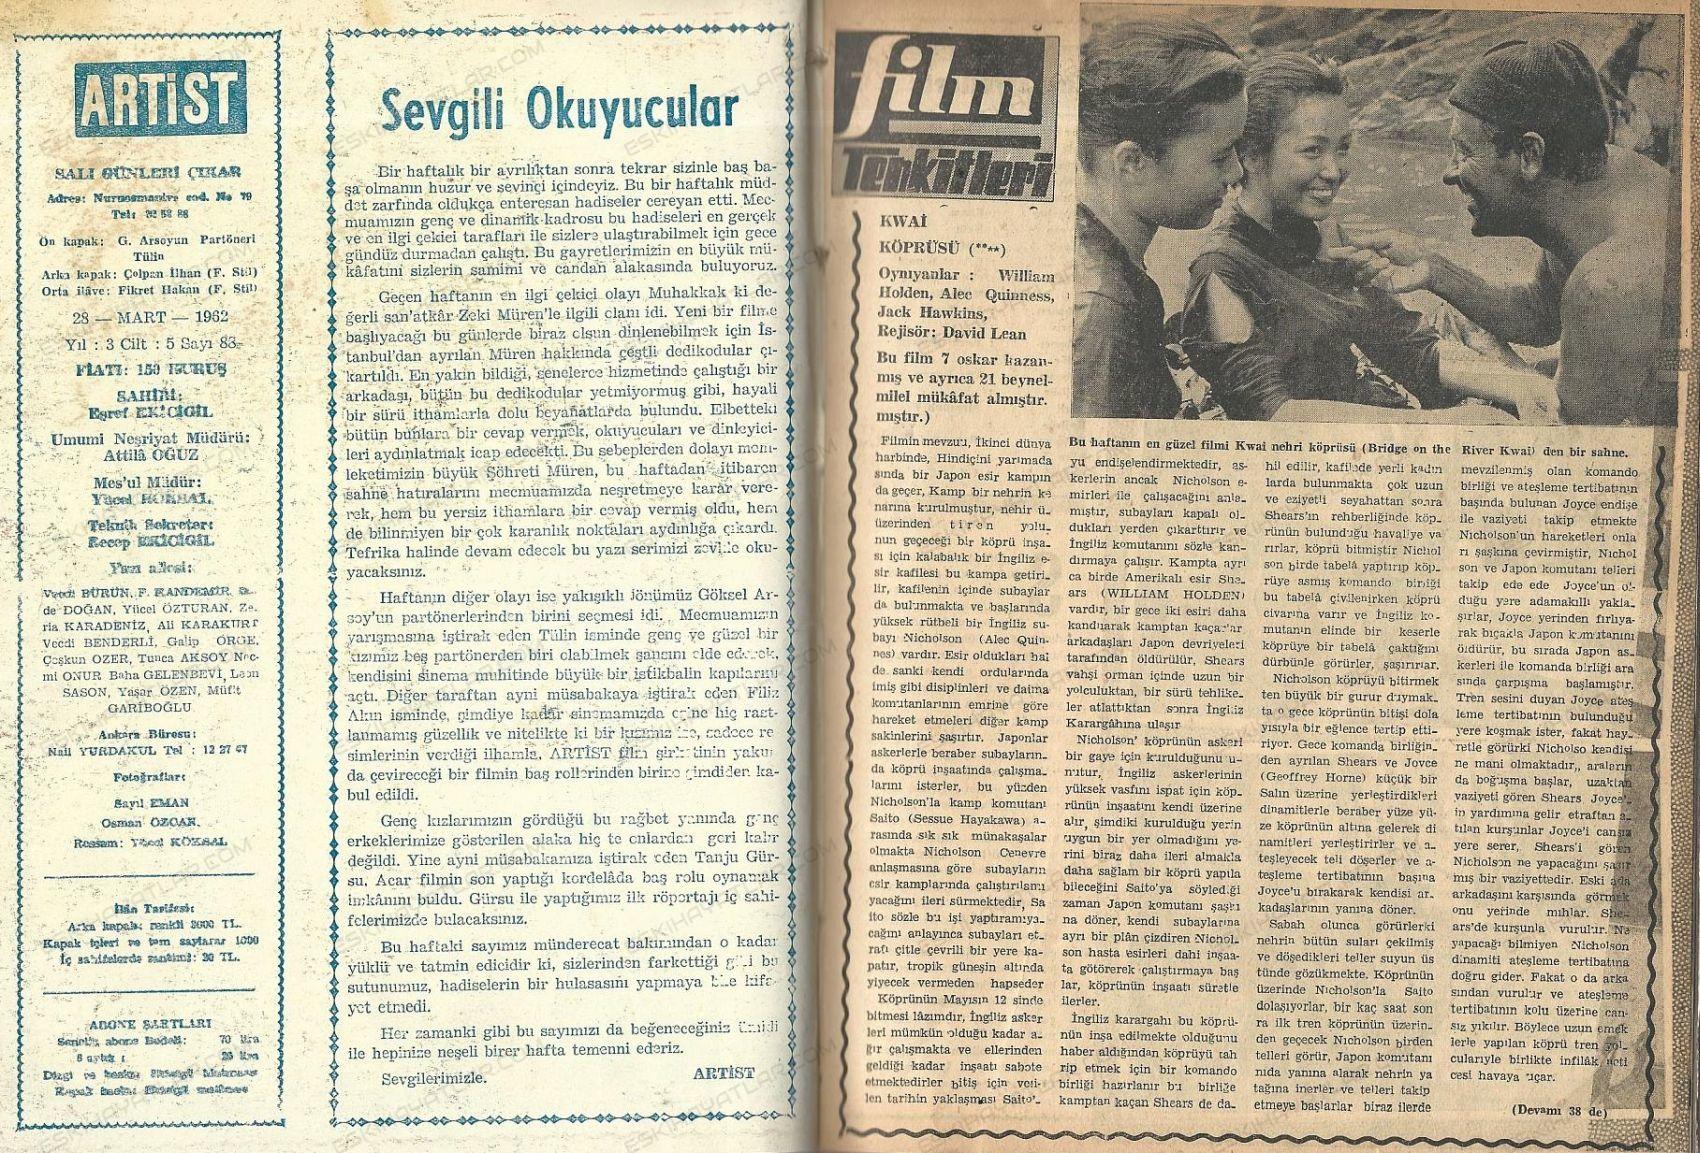 0489-artist-dergisi-1962-arsivi-foto-stil-zeki-muren-haberleri-colpan-ilhan (1)